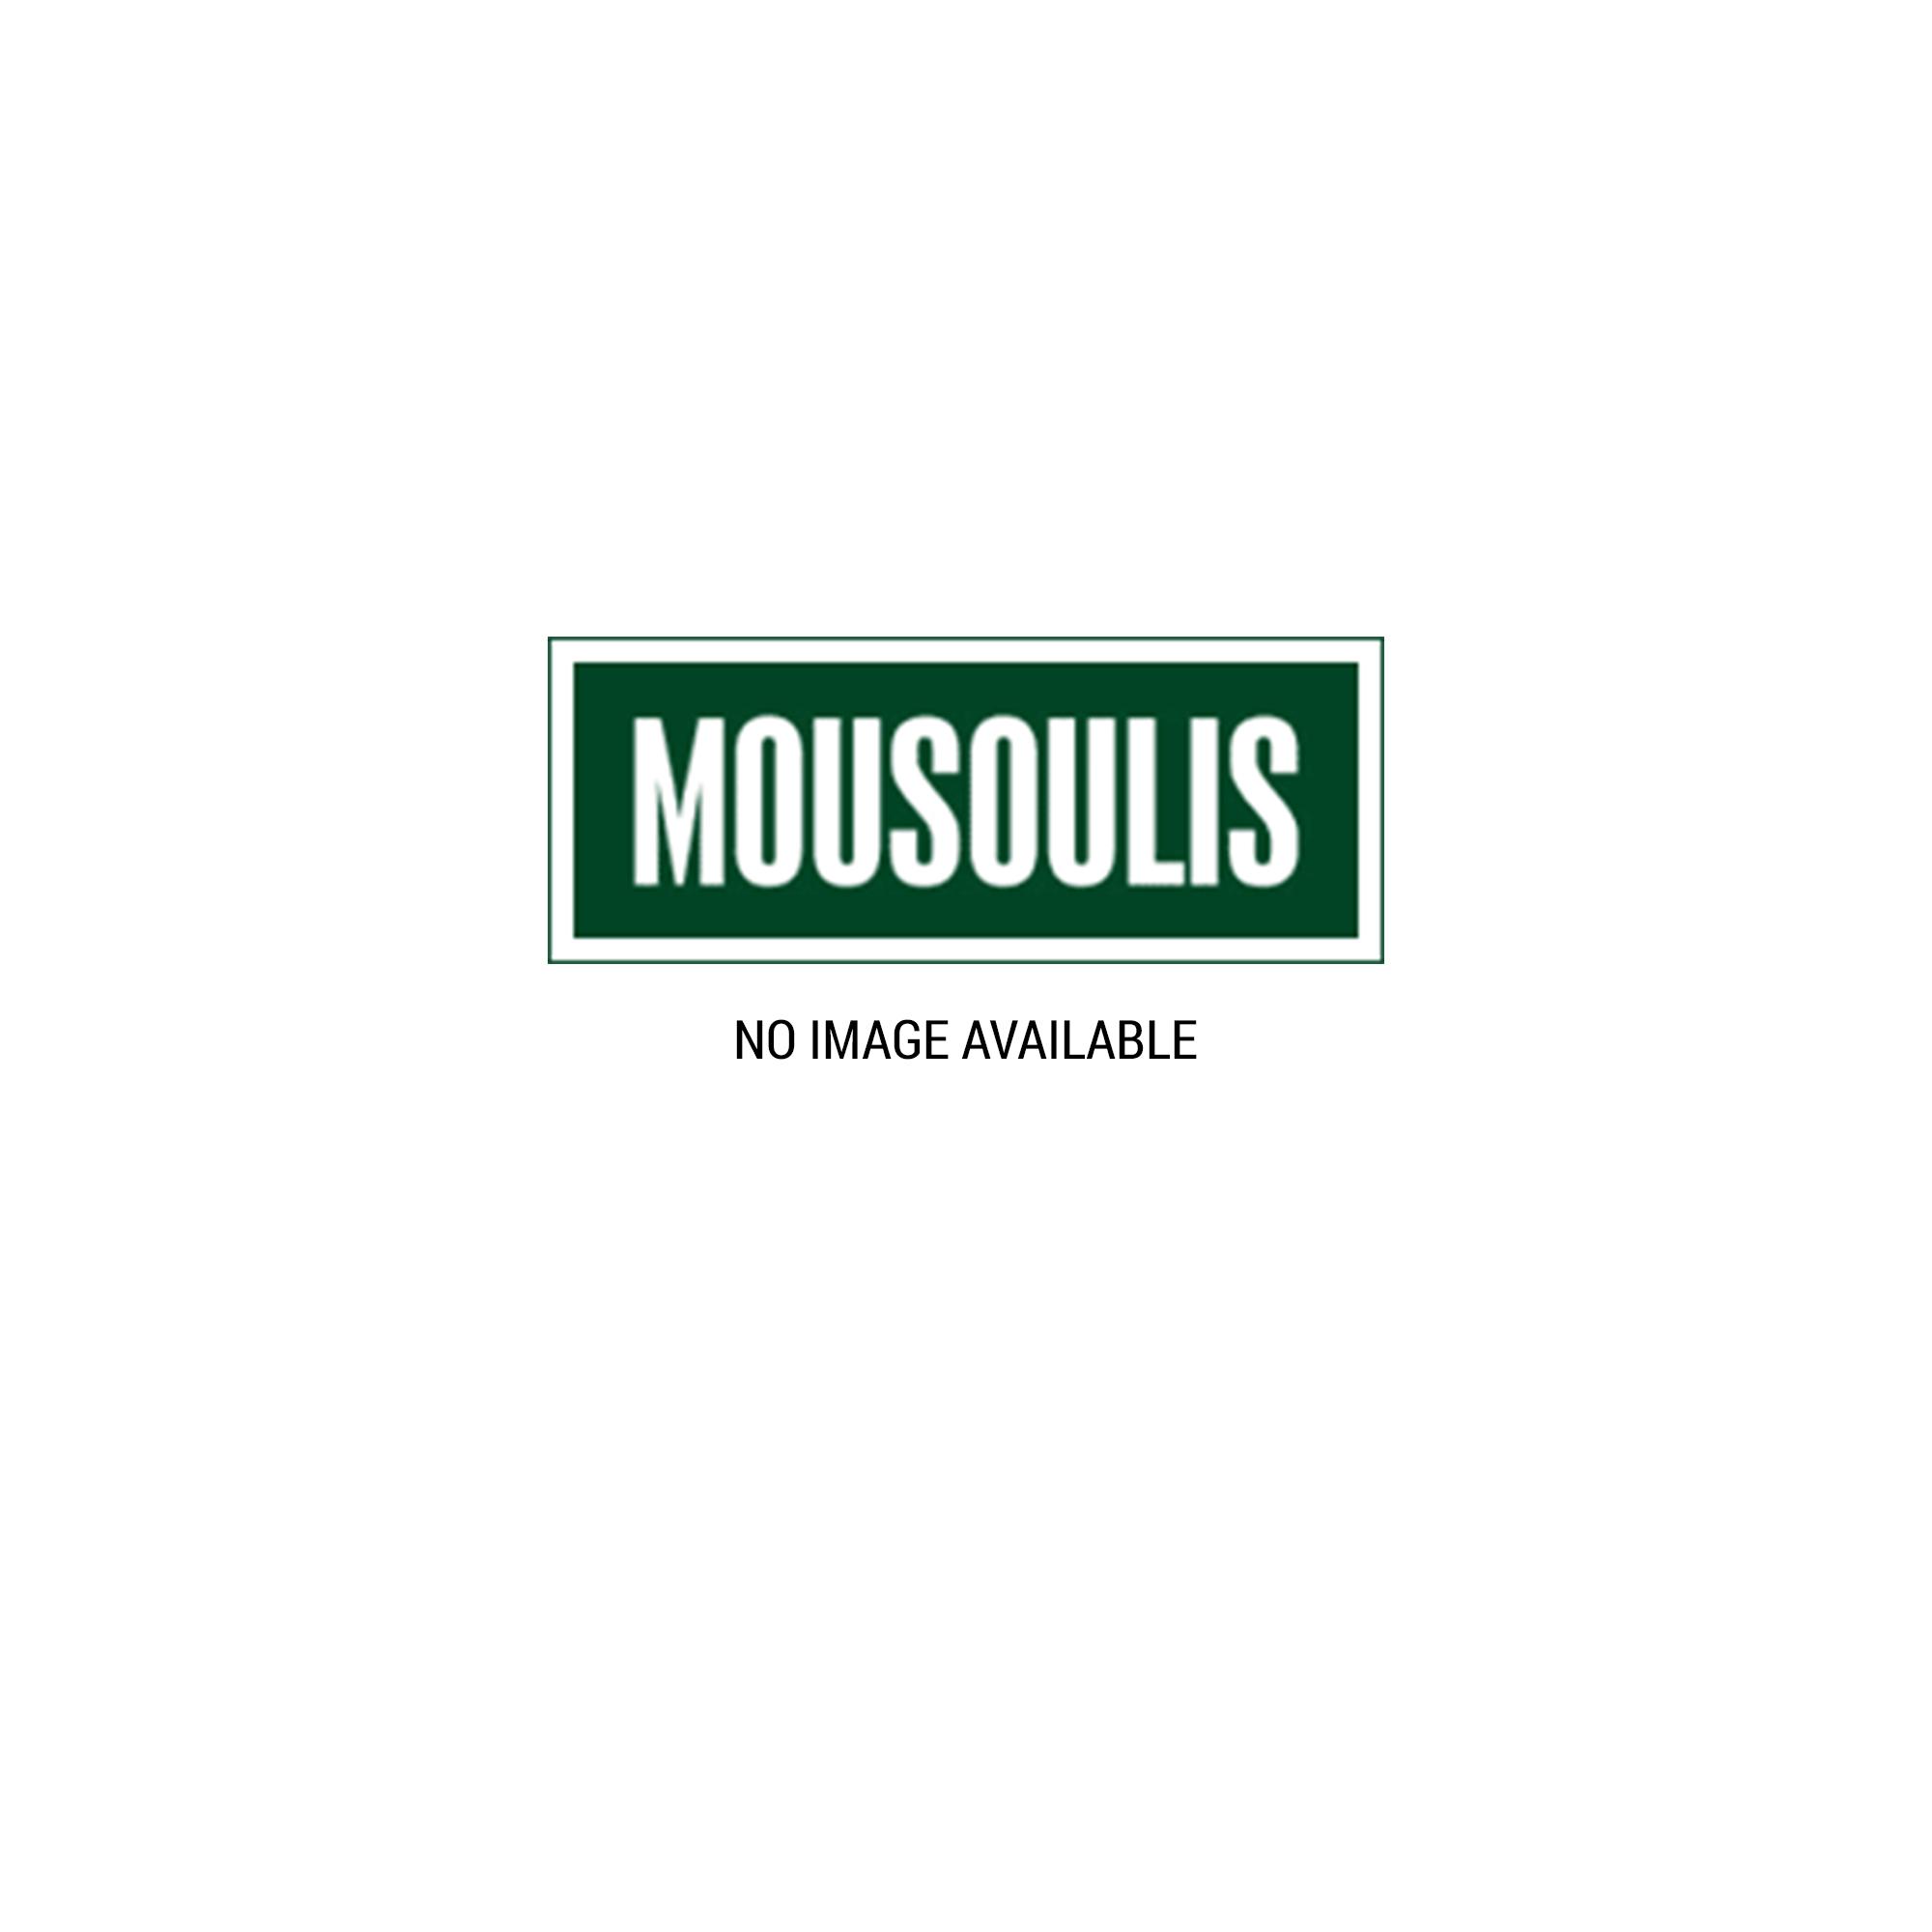 61b3e40702 Αγορά Marlboro Classics Φουλάρι Κασκόλ LAS8938-3300128 Σιέλ